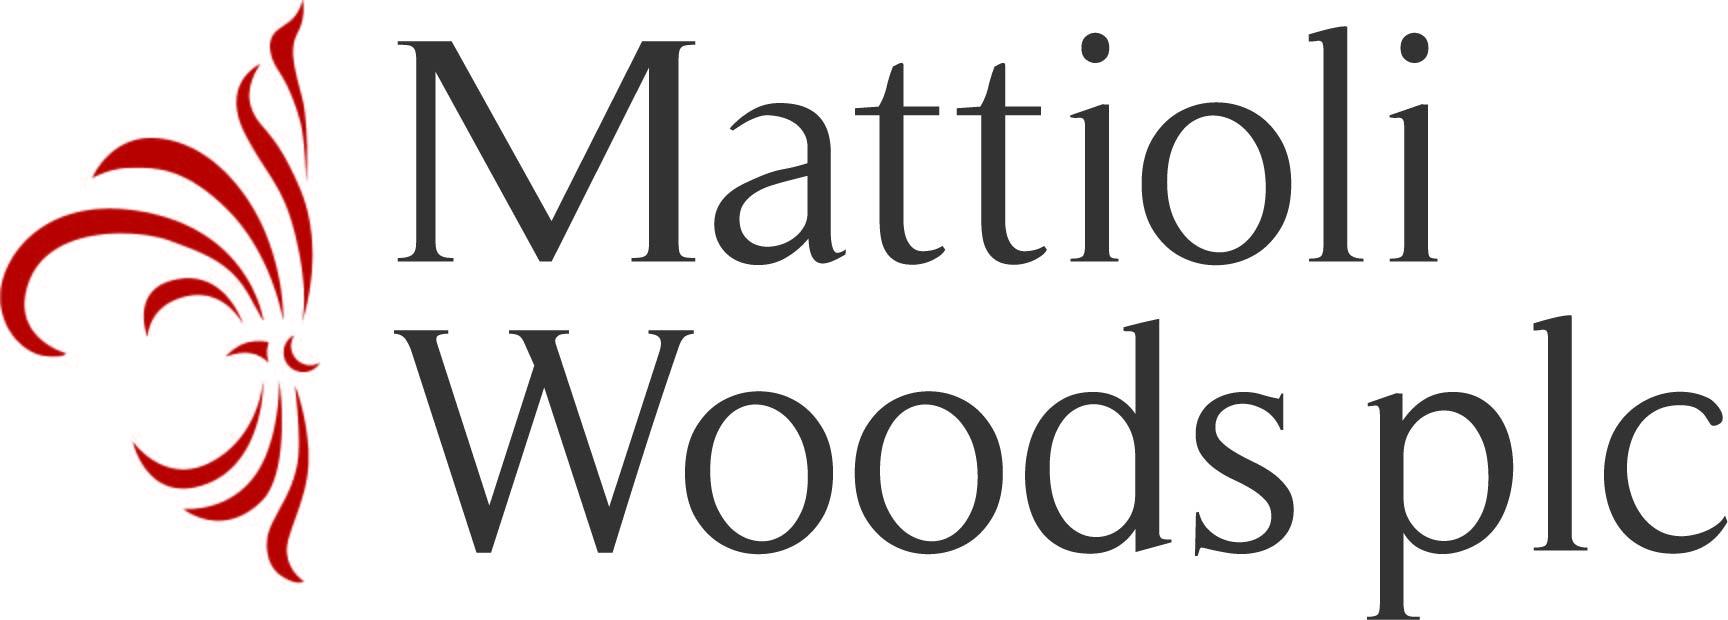 mattioli_woods_logo.jpg